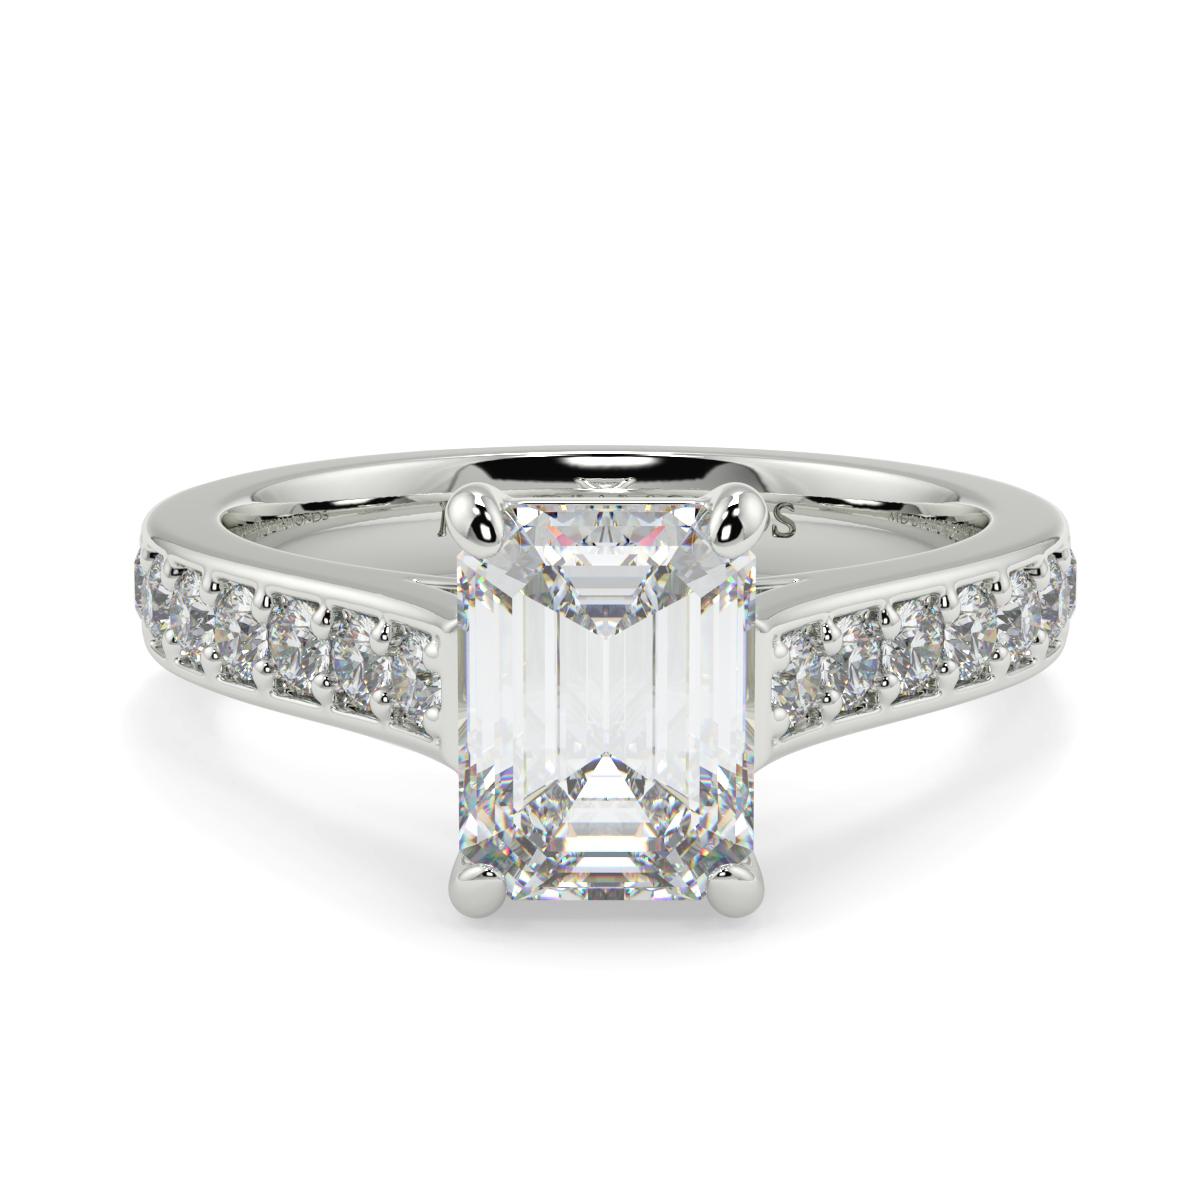 Emerald Cut Pave Set Diamond Ring